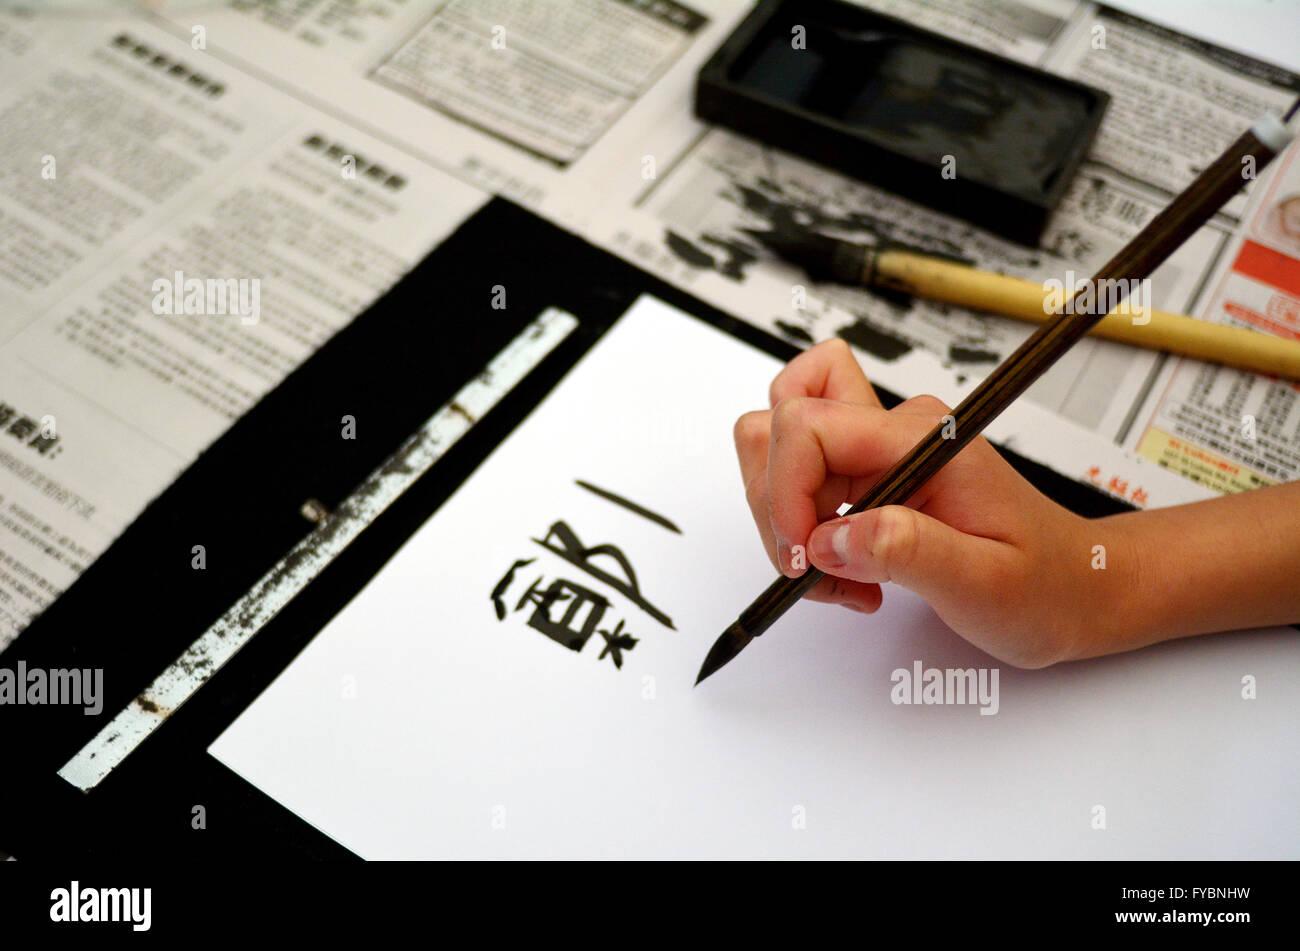 Japanese woman hand writing japanese calligraphy artistic Japanese calligraphy online